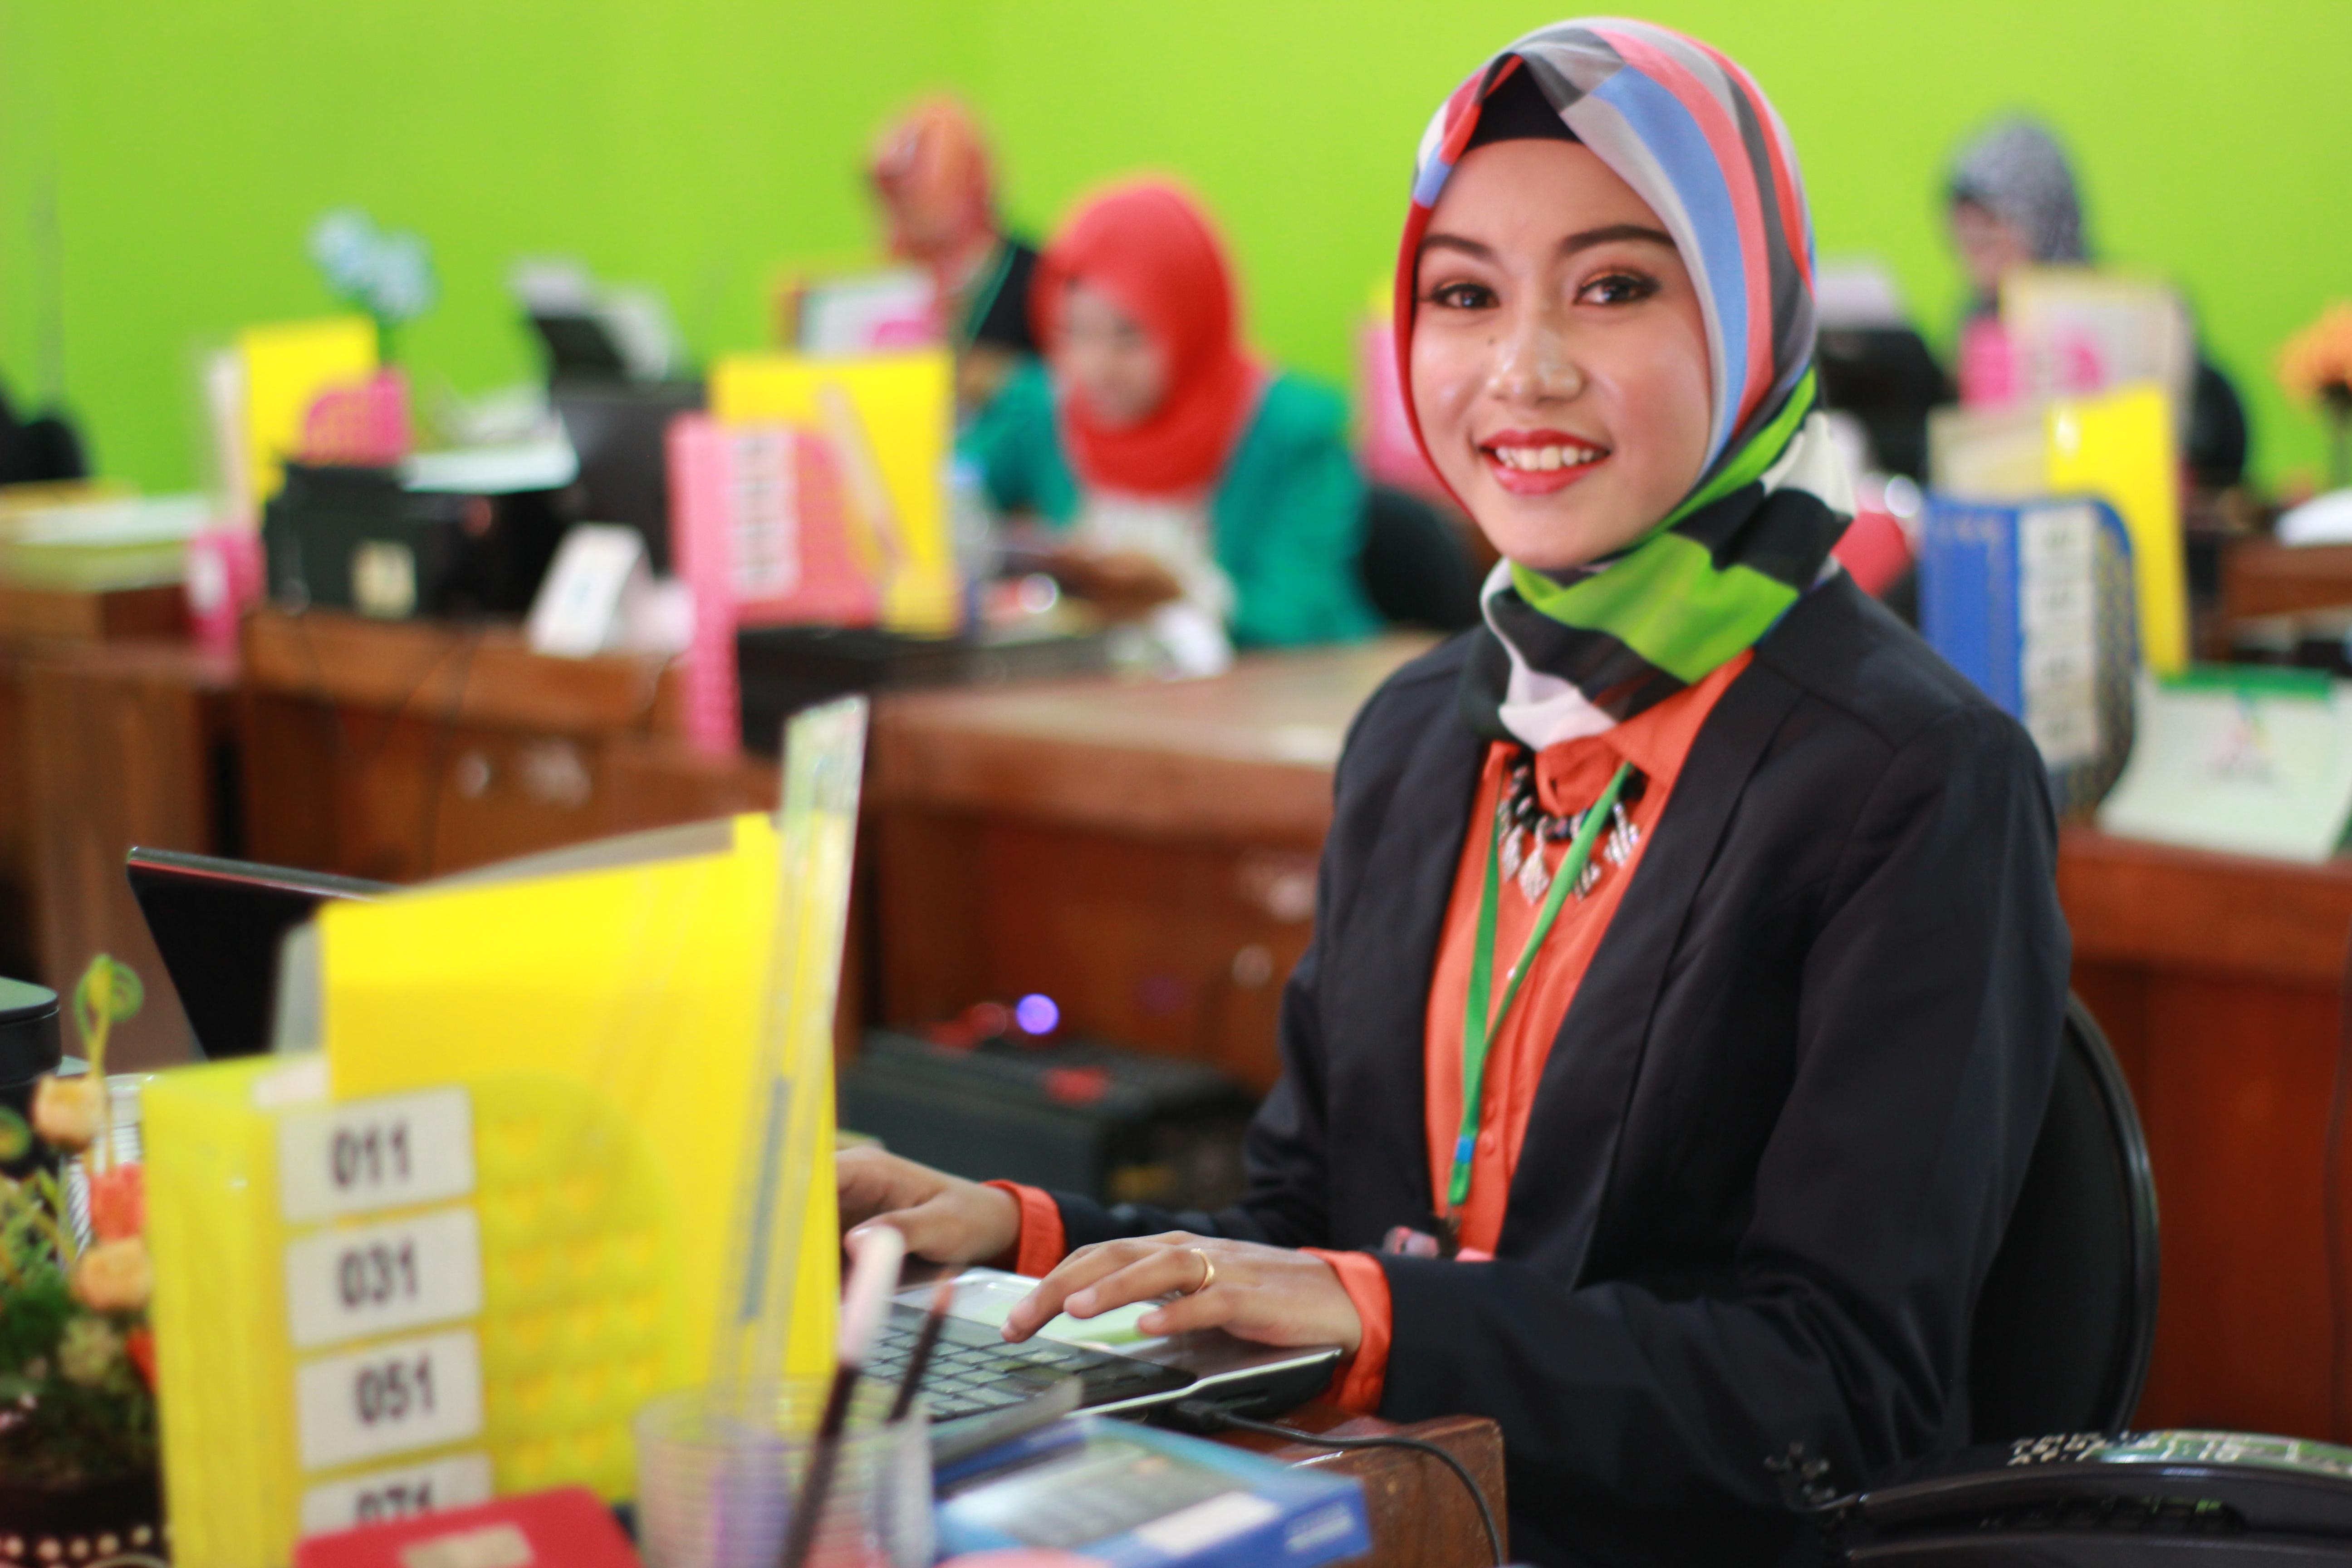 Kompetensi Keahlian Otomatisasi Dan Tata Kelola Perkantoran Smk Negeri 2 Blora